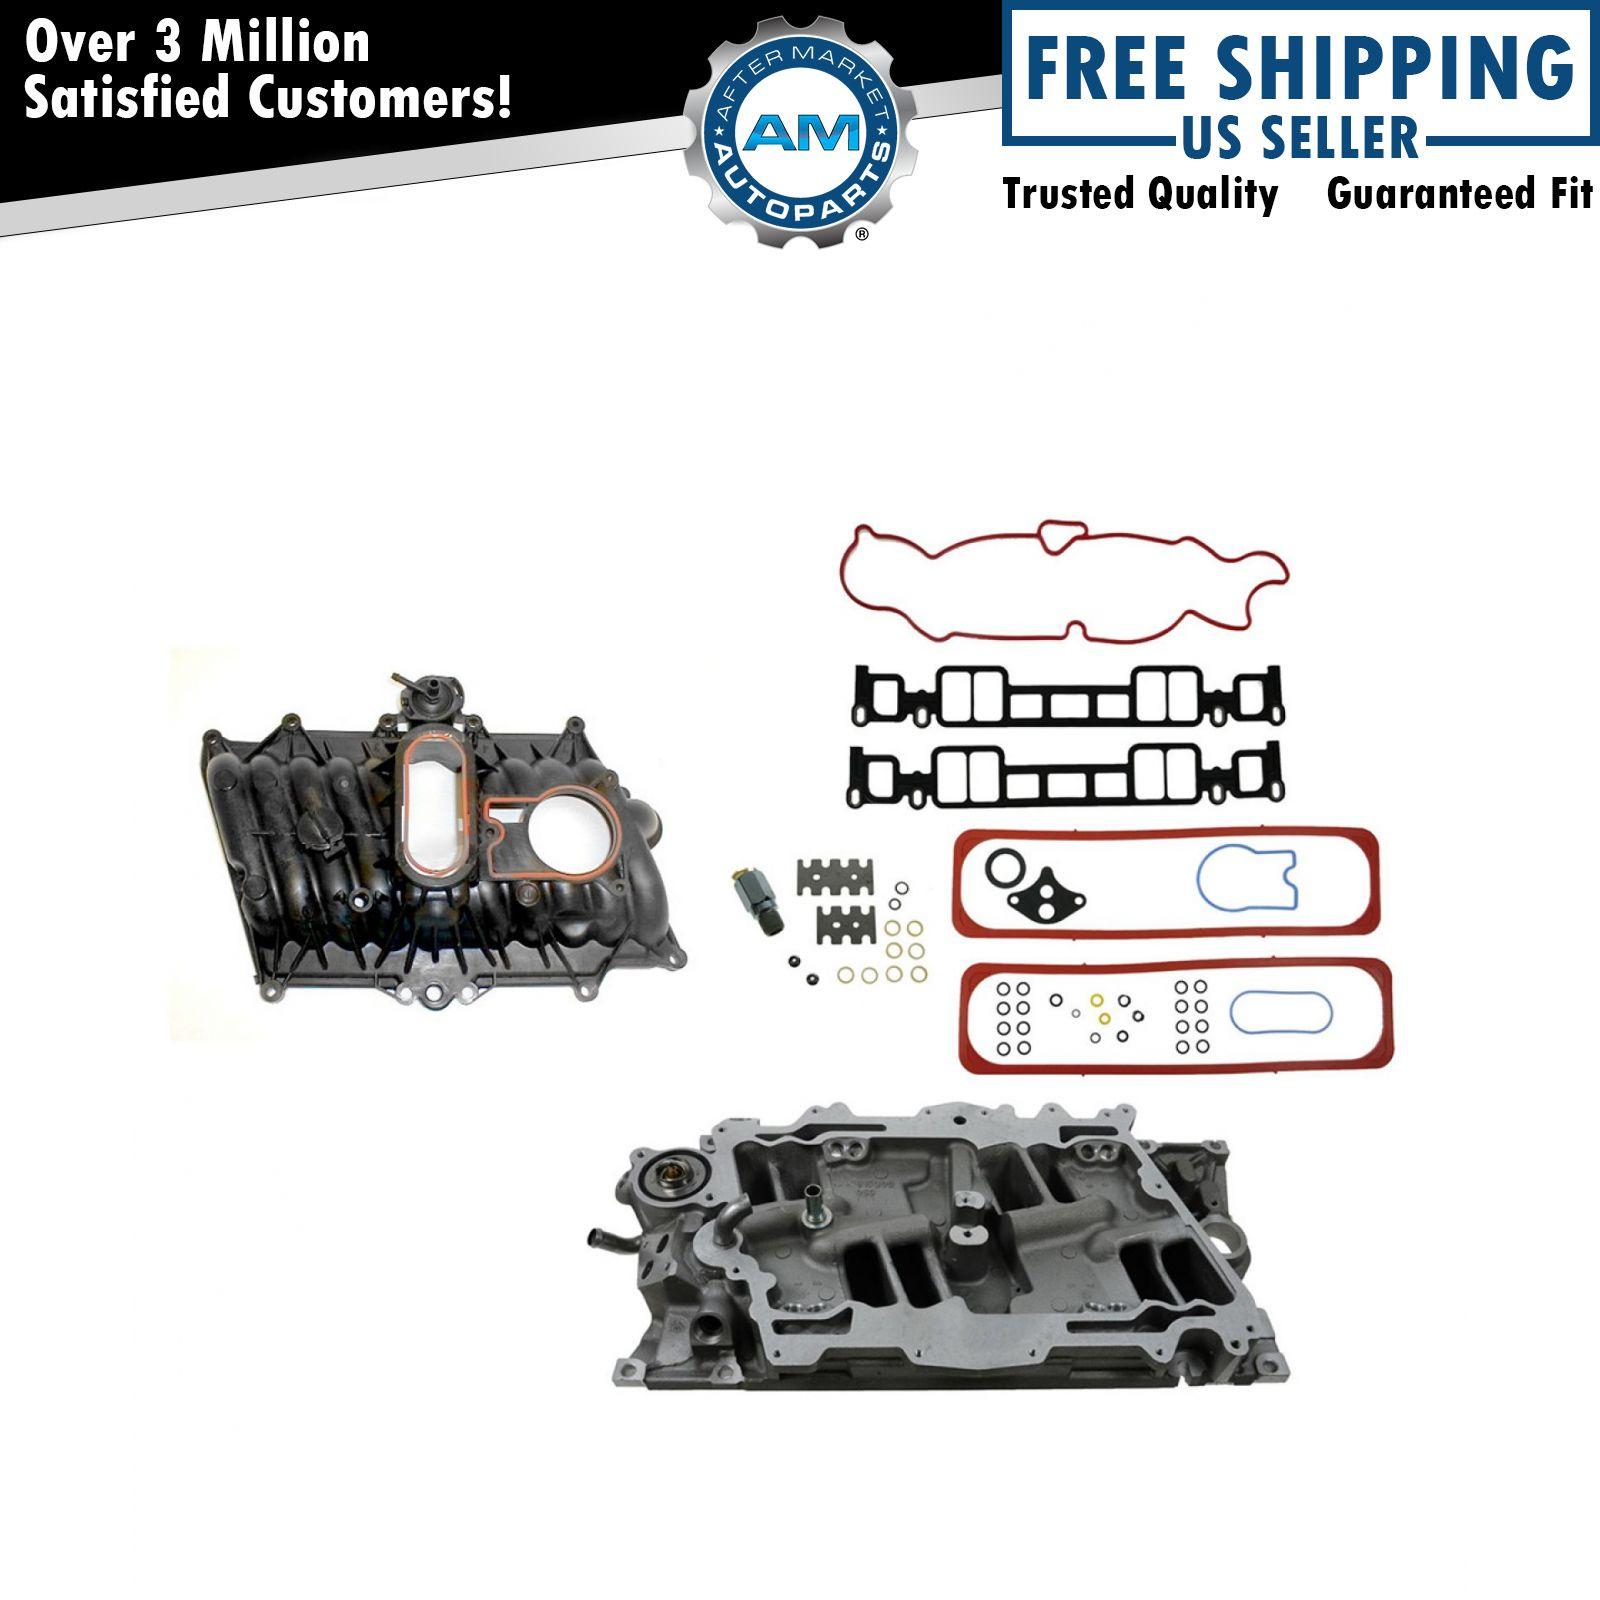 Dorman Upper Lower Intake Manifold Kit For Chevy GMC Truck